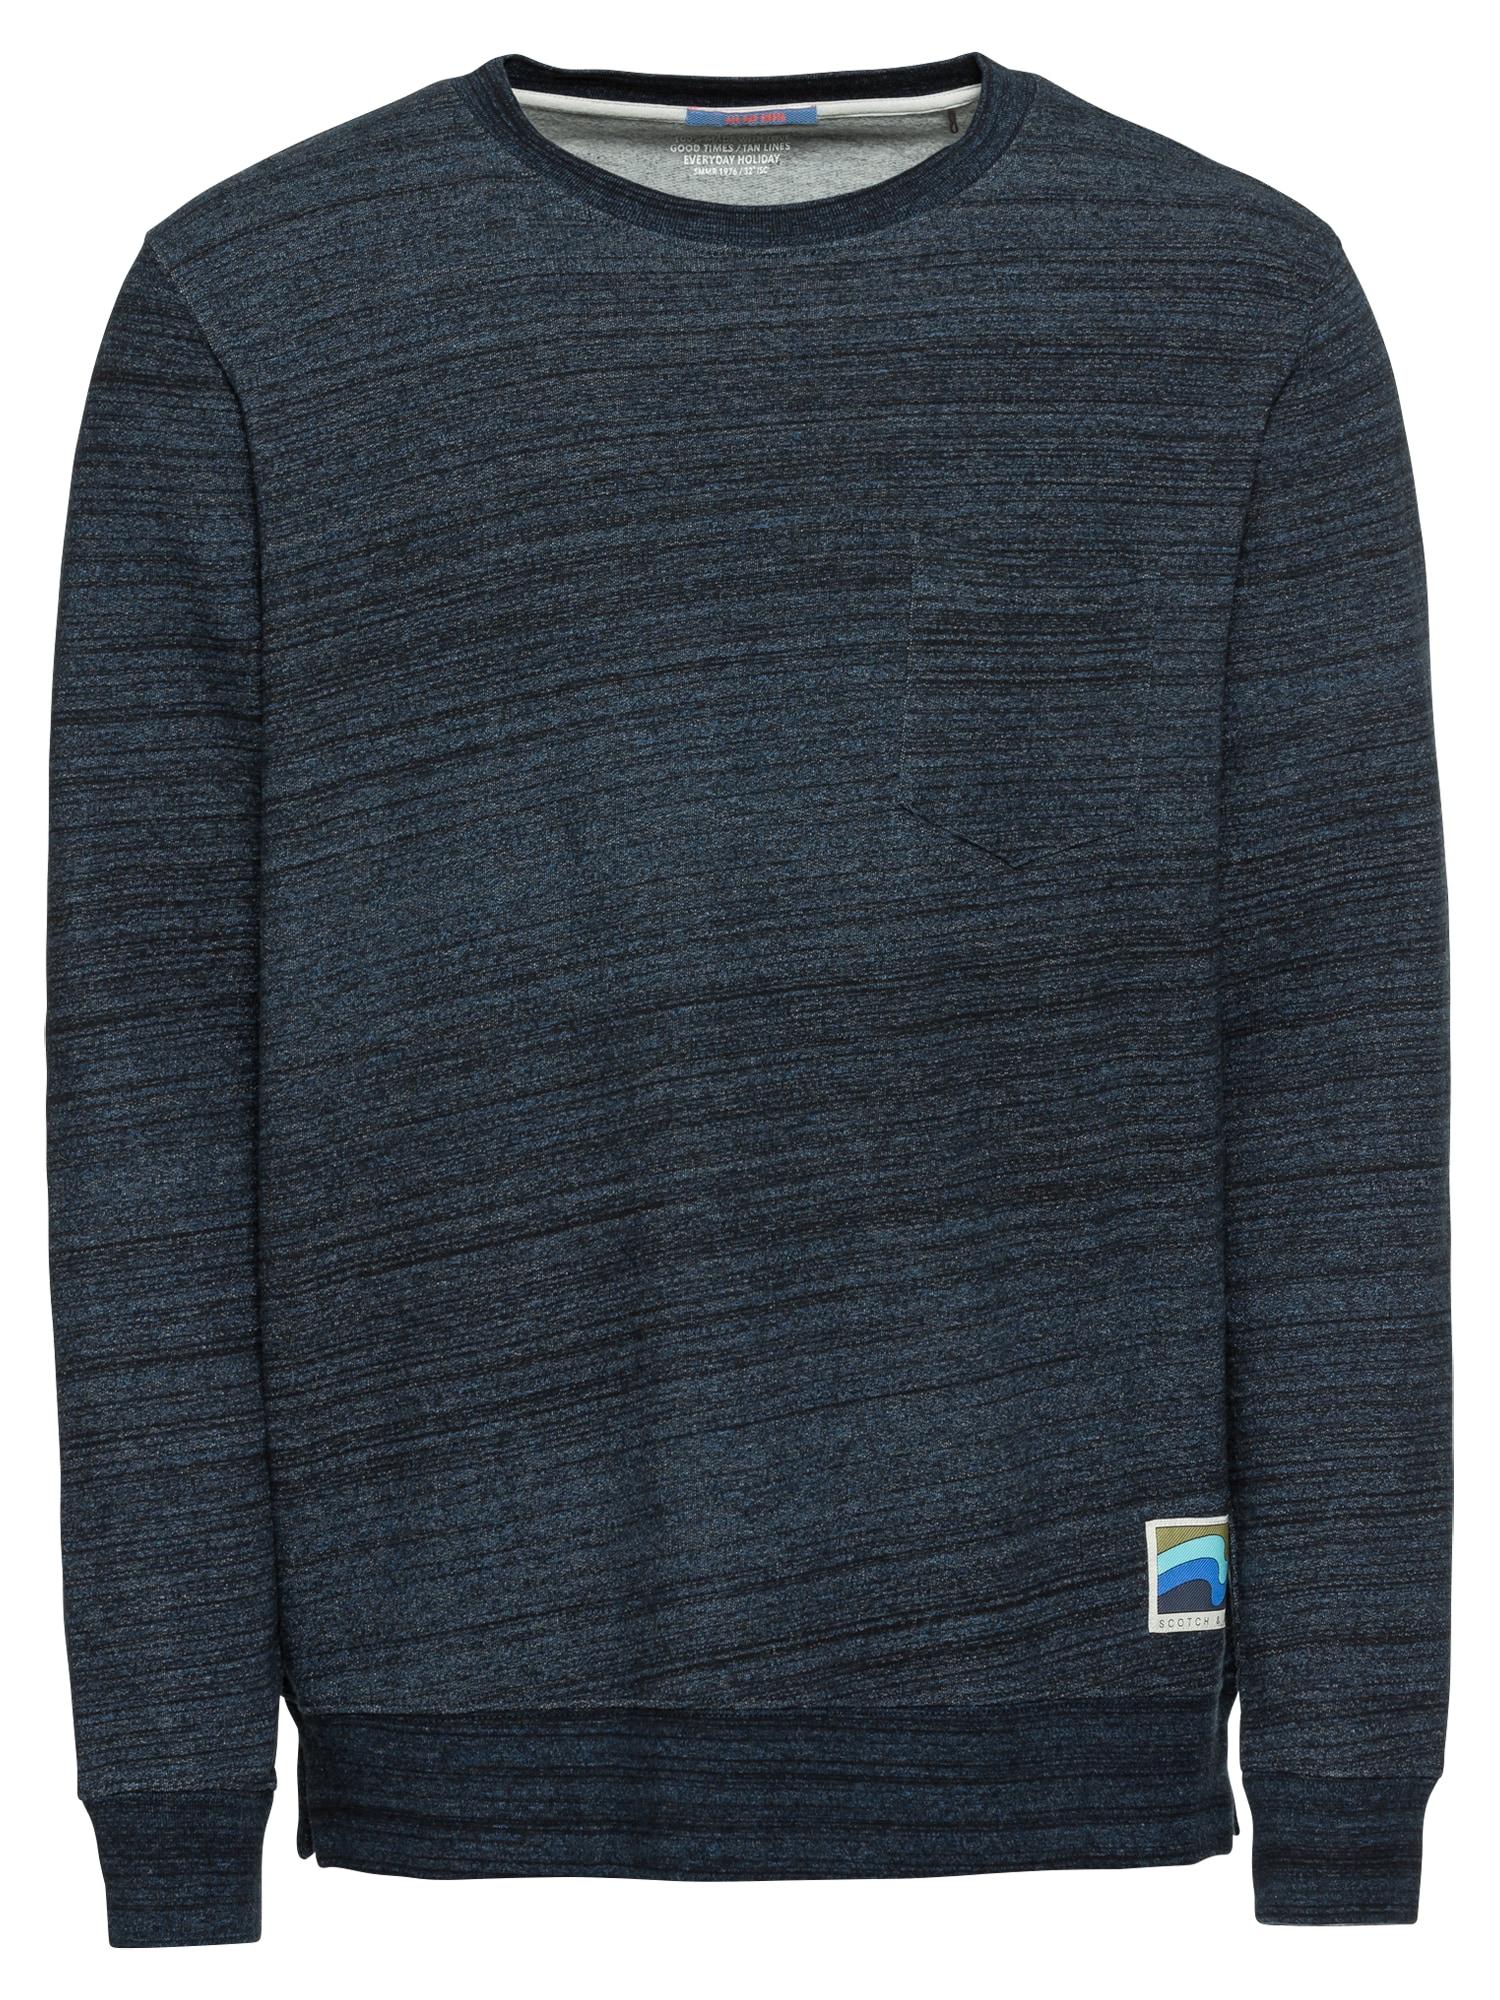 Tričko kobaltová modř černý melír SCOTCH & SODA